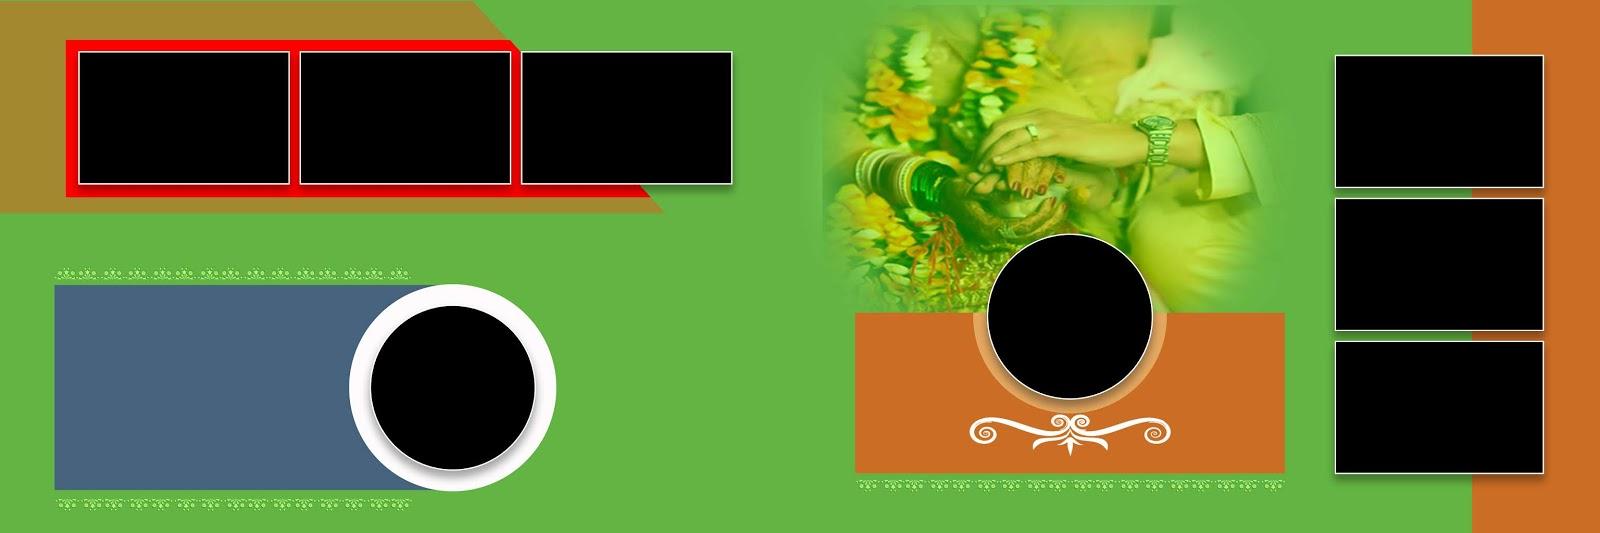 Vol 3 2019 20 Indian Karizma Album Design 12x36 Psd